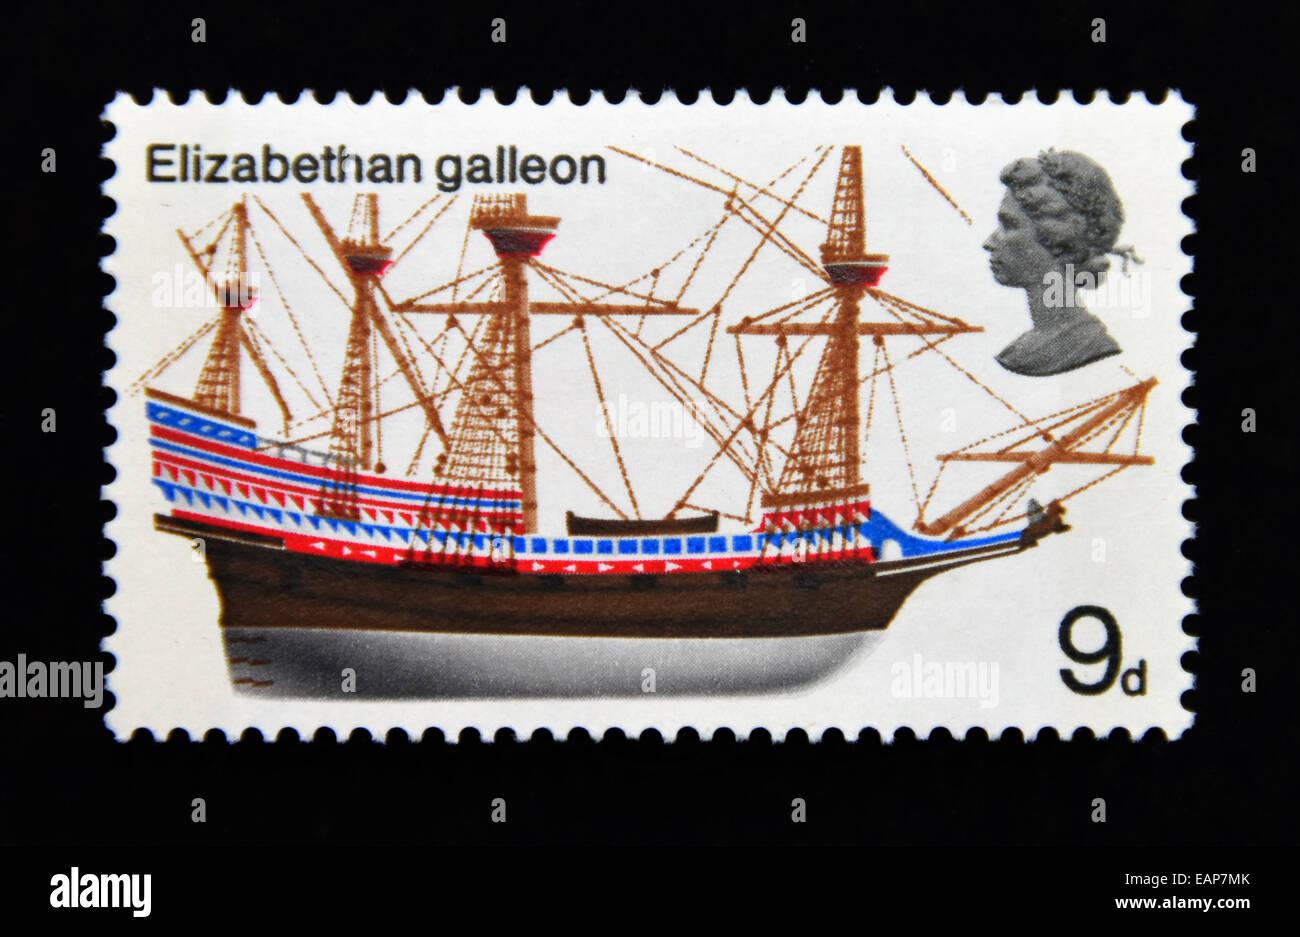 Postage stamp. Great Britain. Queen Elizabeth II. British Ships. 1969. Elizabethan galleon. 9d. - Stock Image